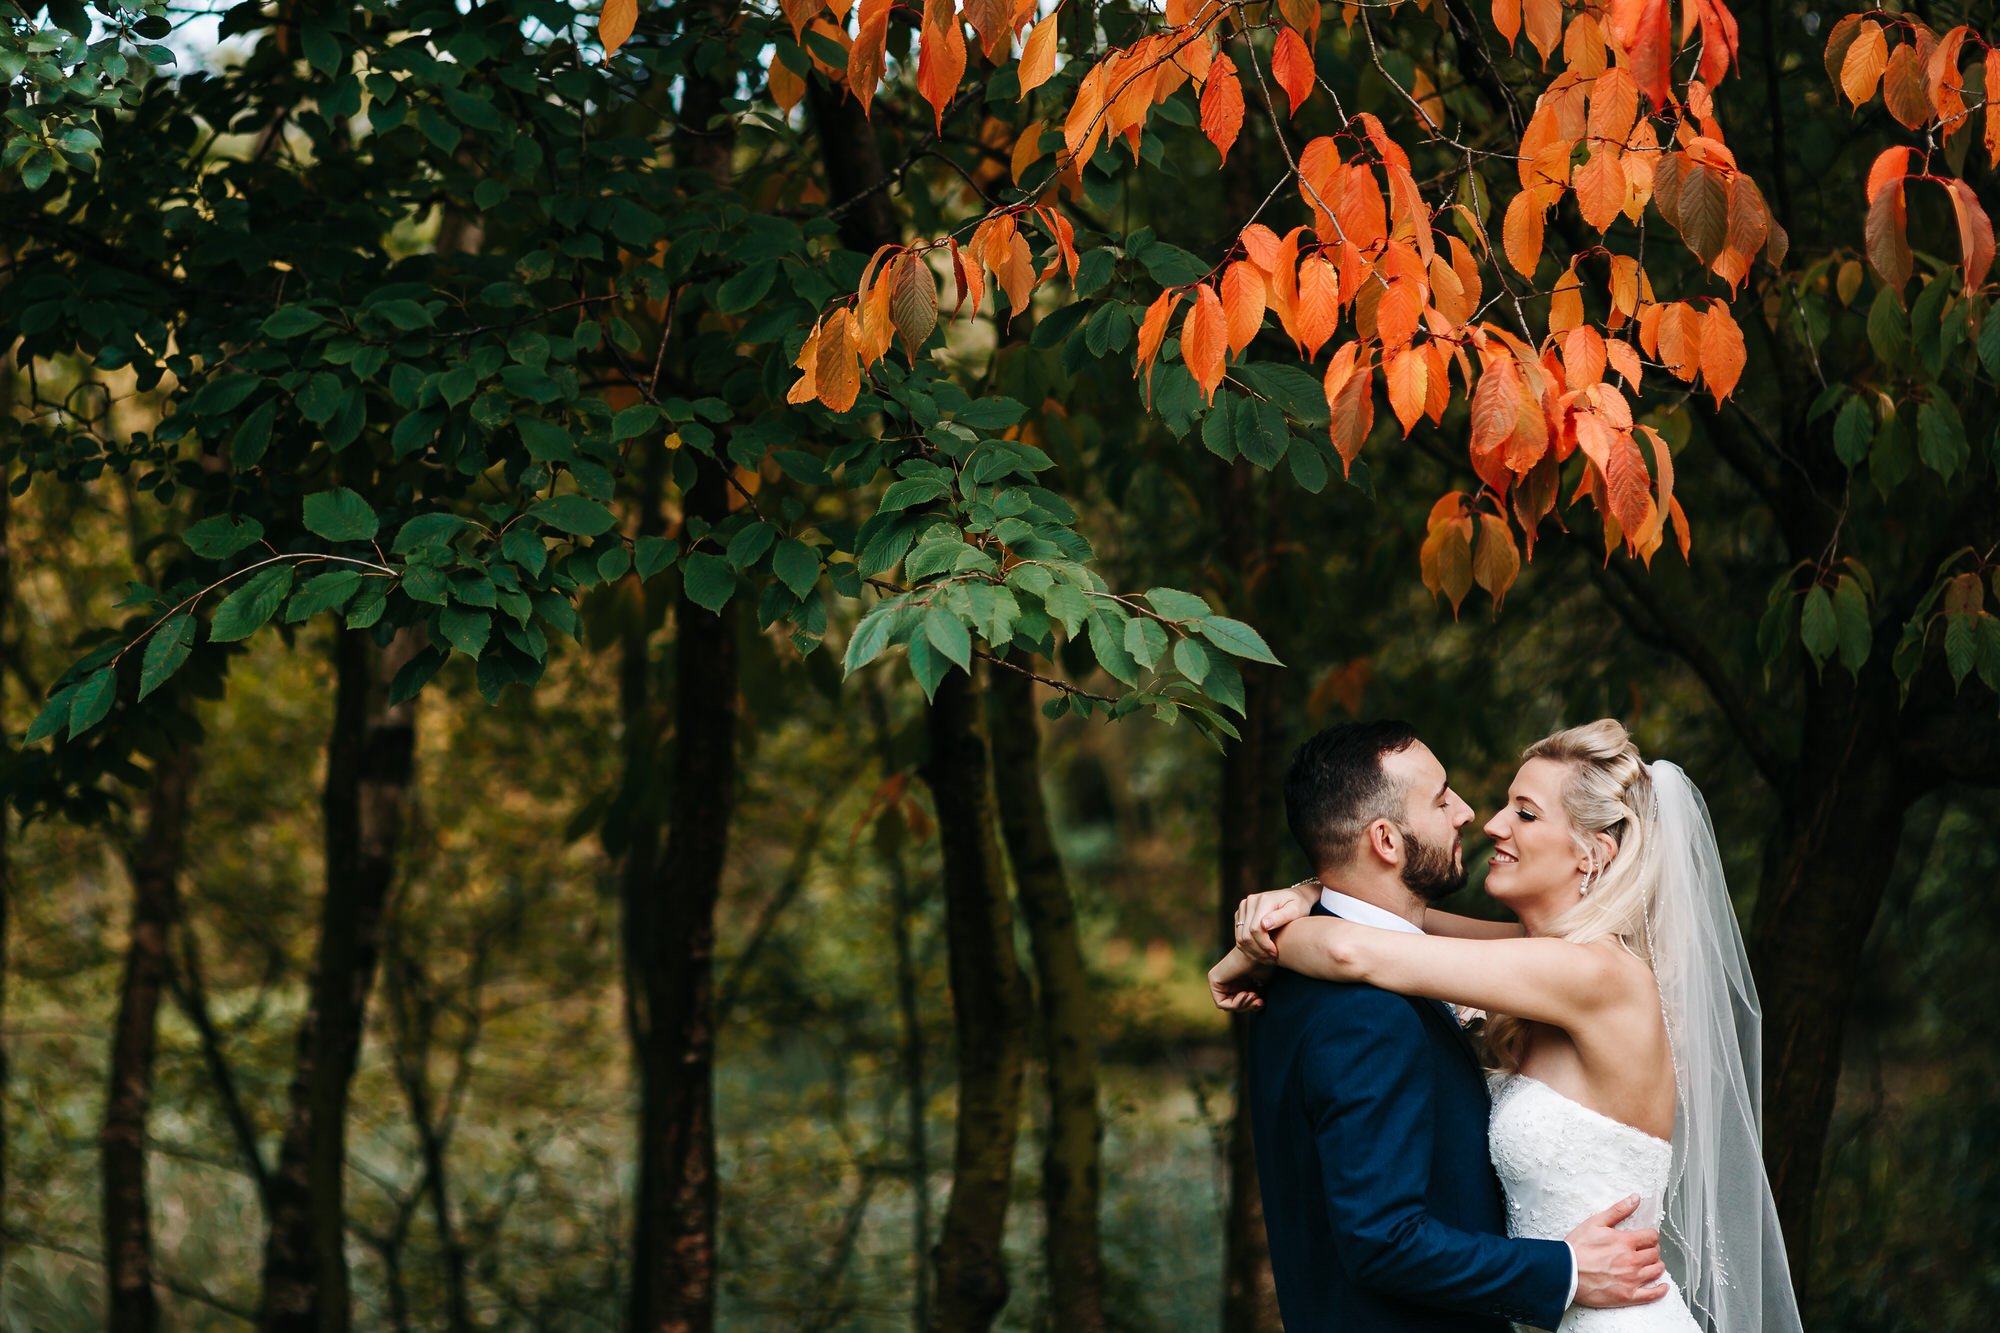 Best Of Yorkshire Wedding Photography 2017 - Martyn Hand-8.jpg